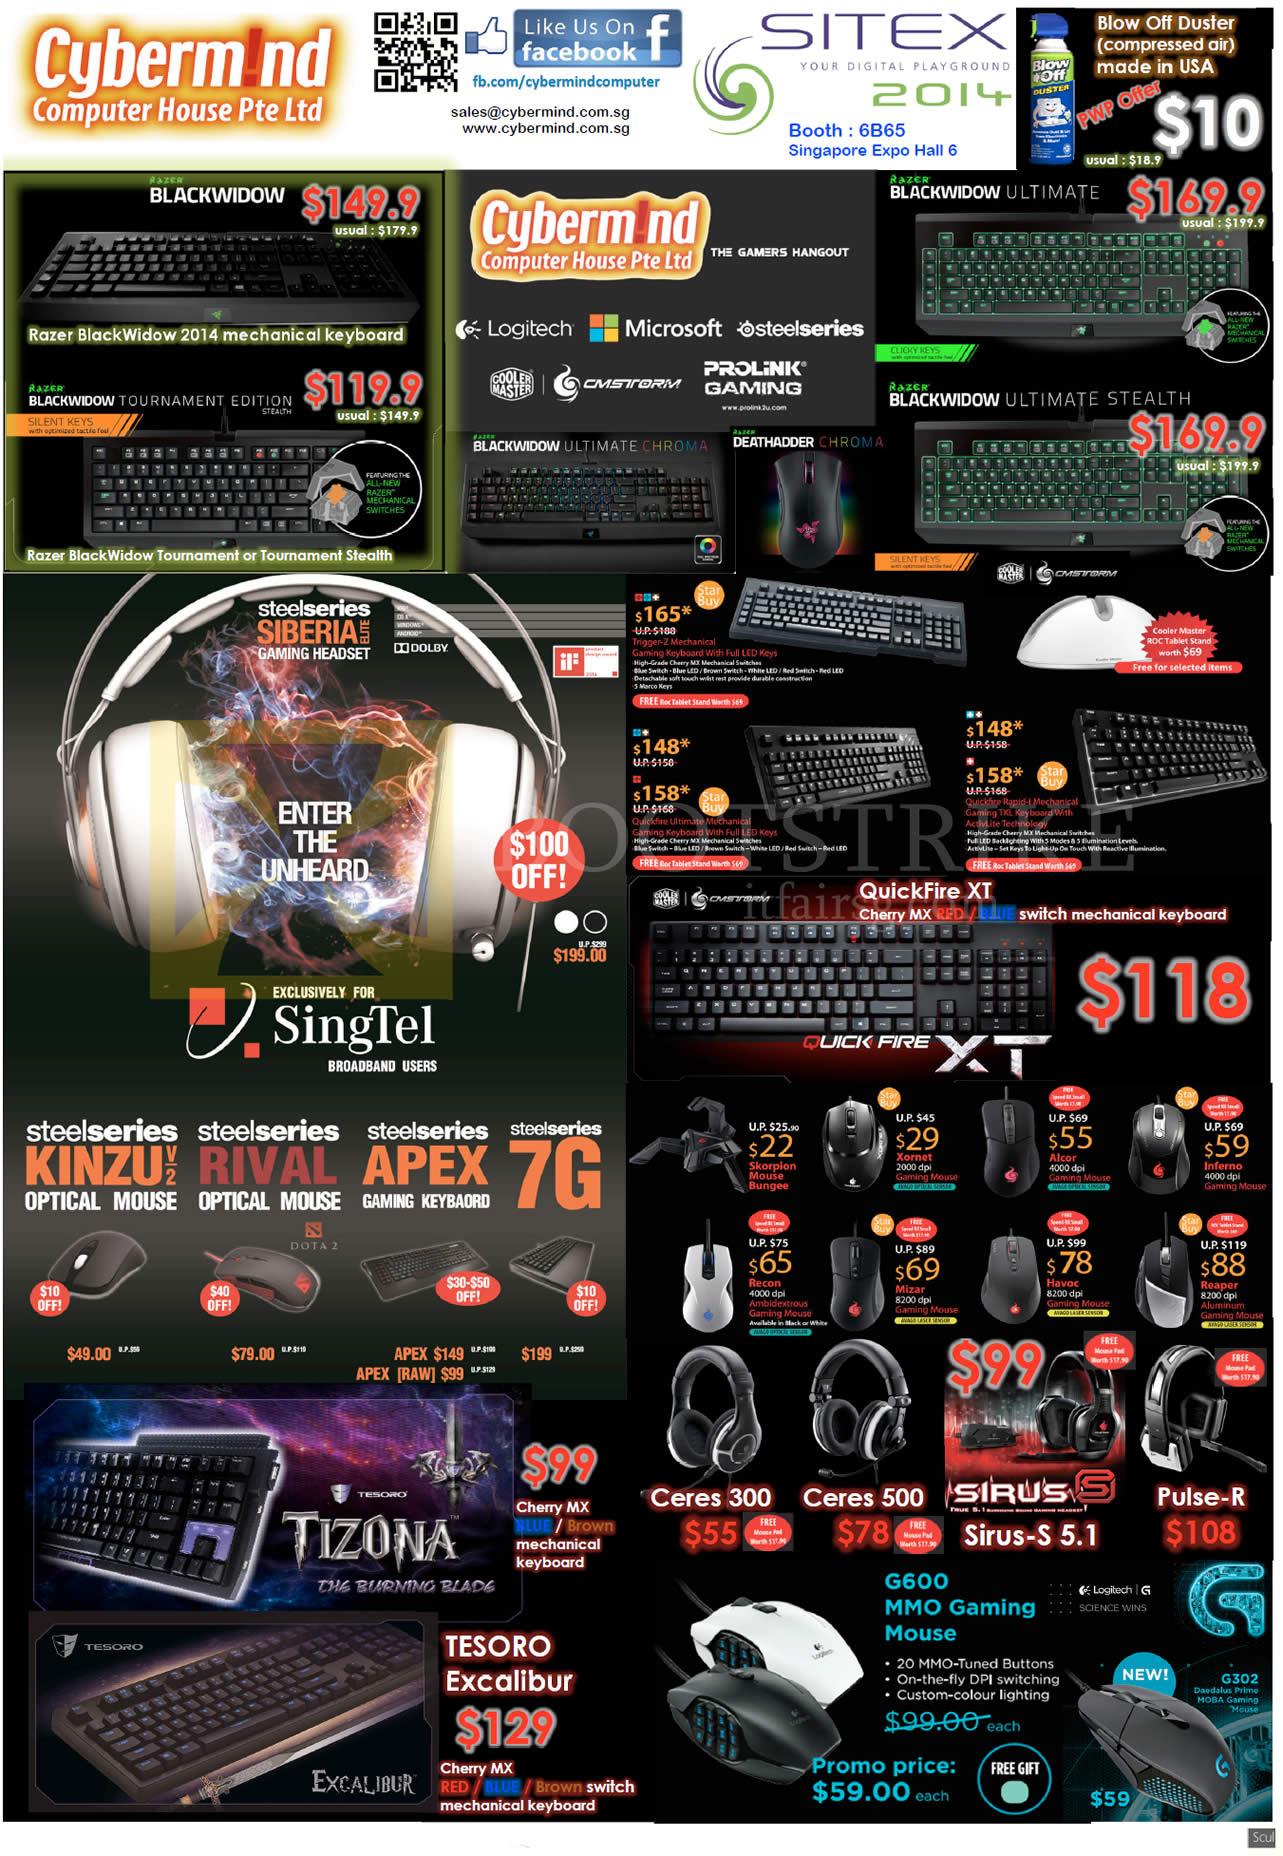 SITEX 2014 price list image brochure of Cybermind Keyboards Mouse, Razer, Logitech, Blackwidow, Steelseries Ceres, Sirus, Tesoro, Tizona, QuickFire XT